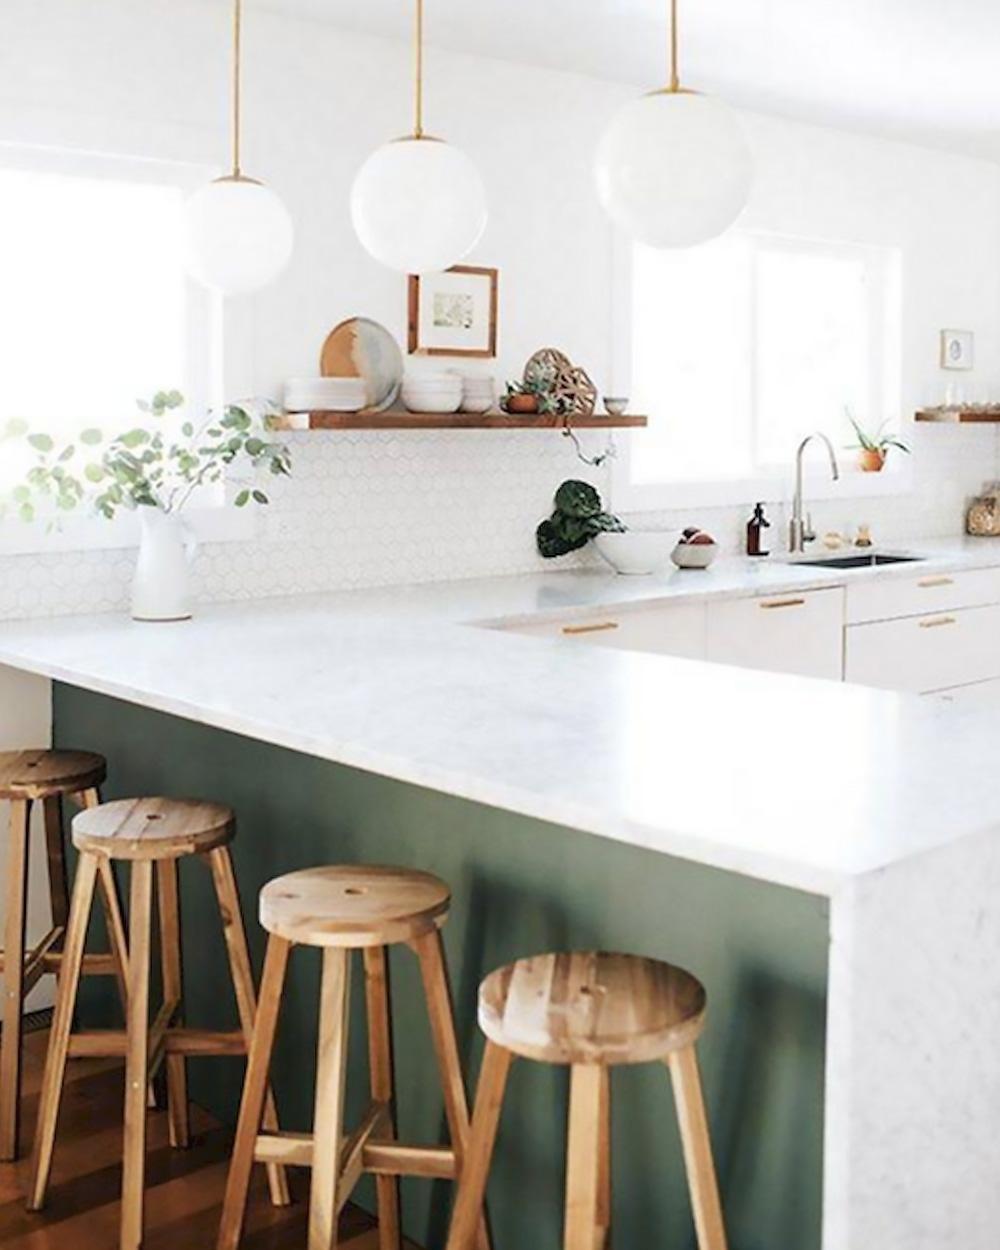 comptoir de cuisine vert et marbre blanc